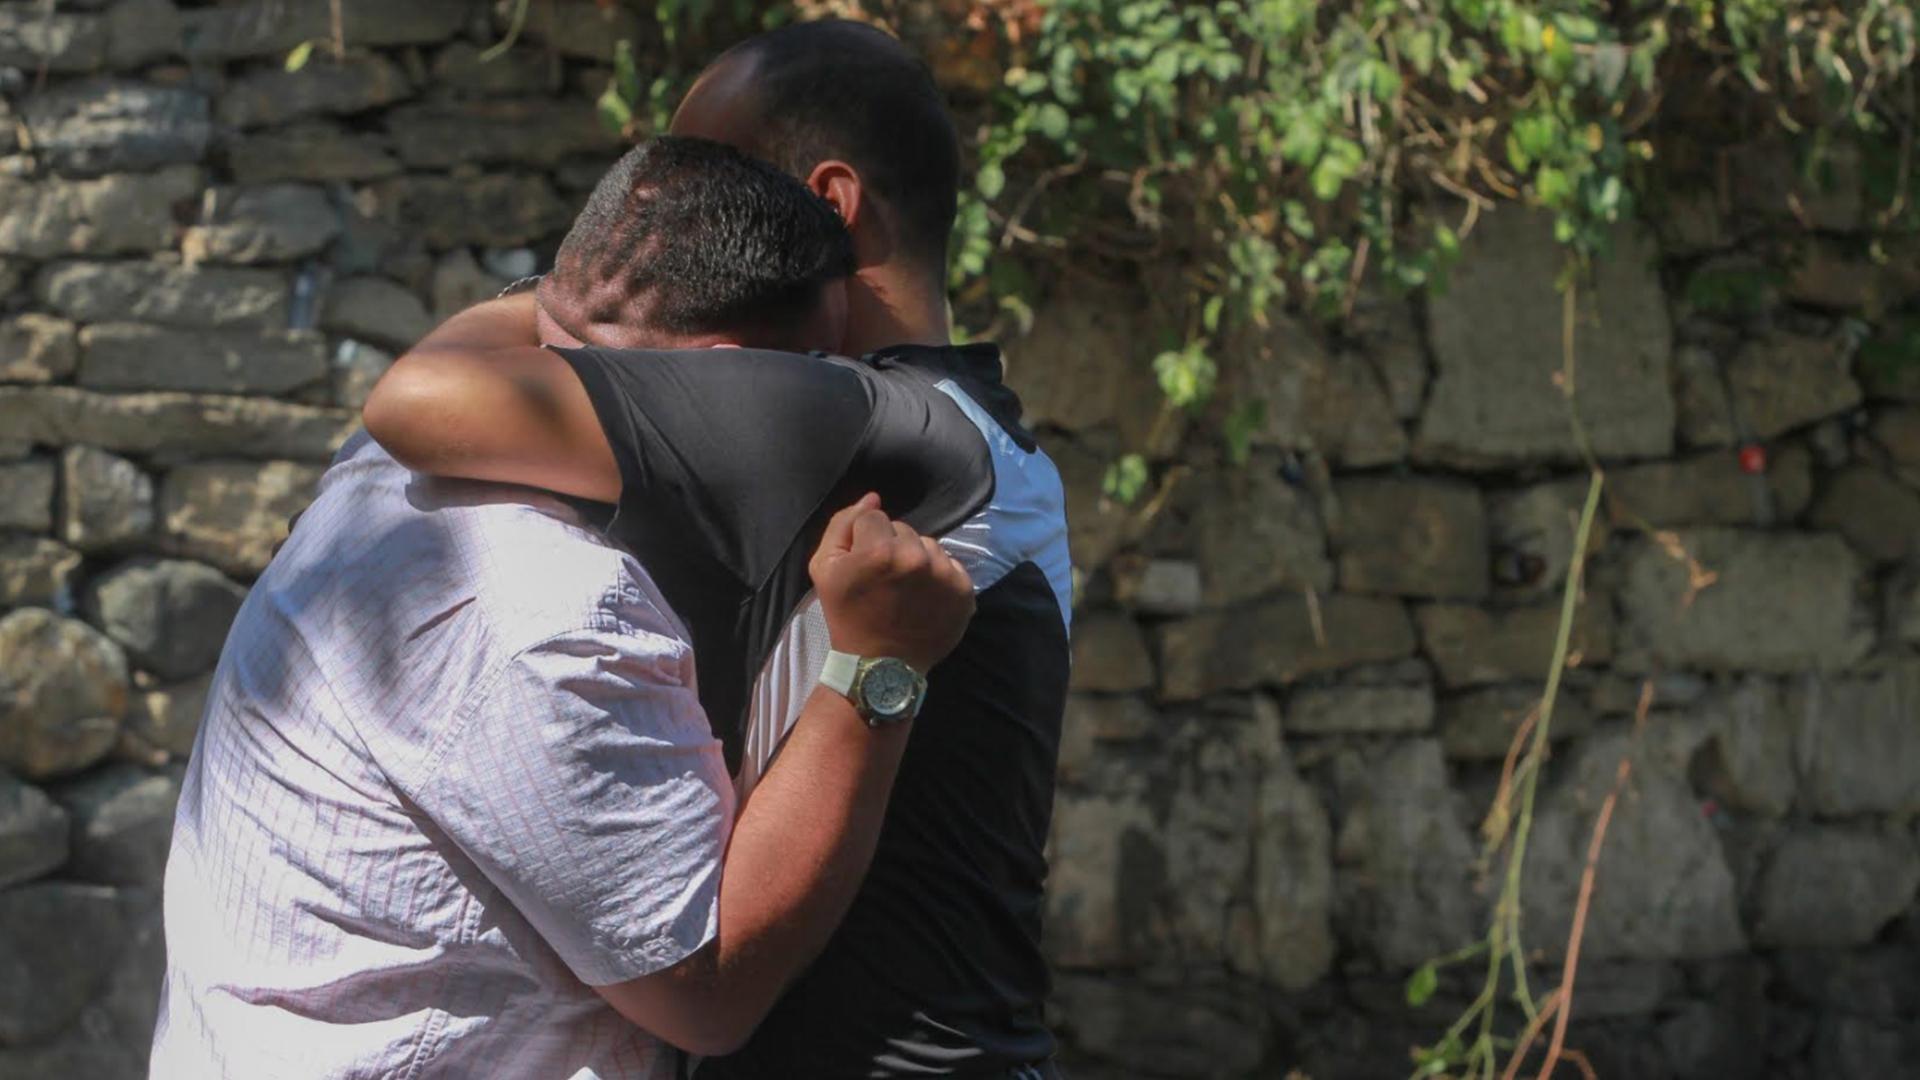 #MonitorDeVíctimas | Mujer celosa mató a su marido de dos cuchilladas